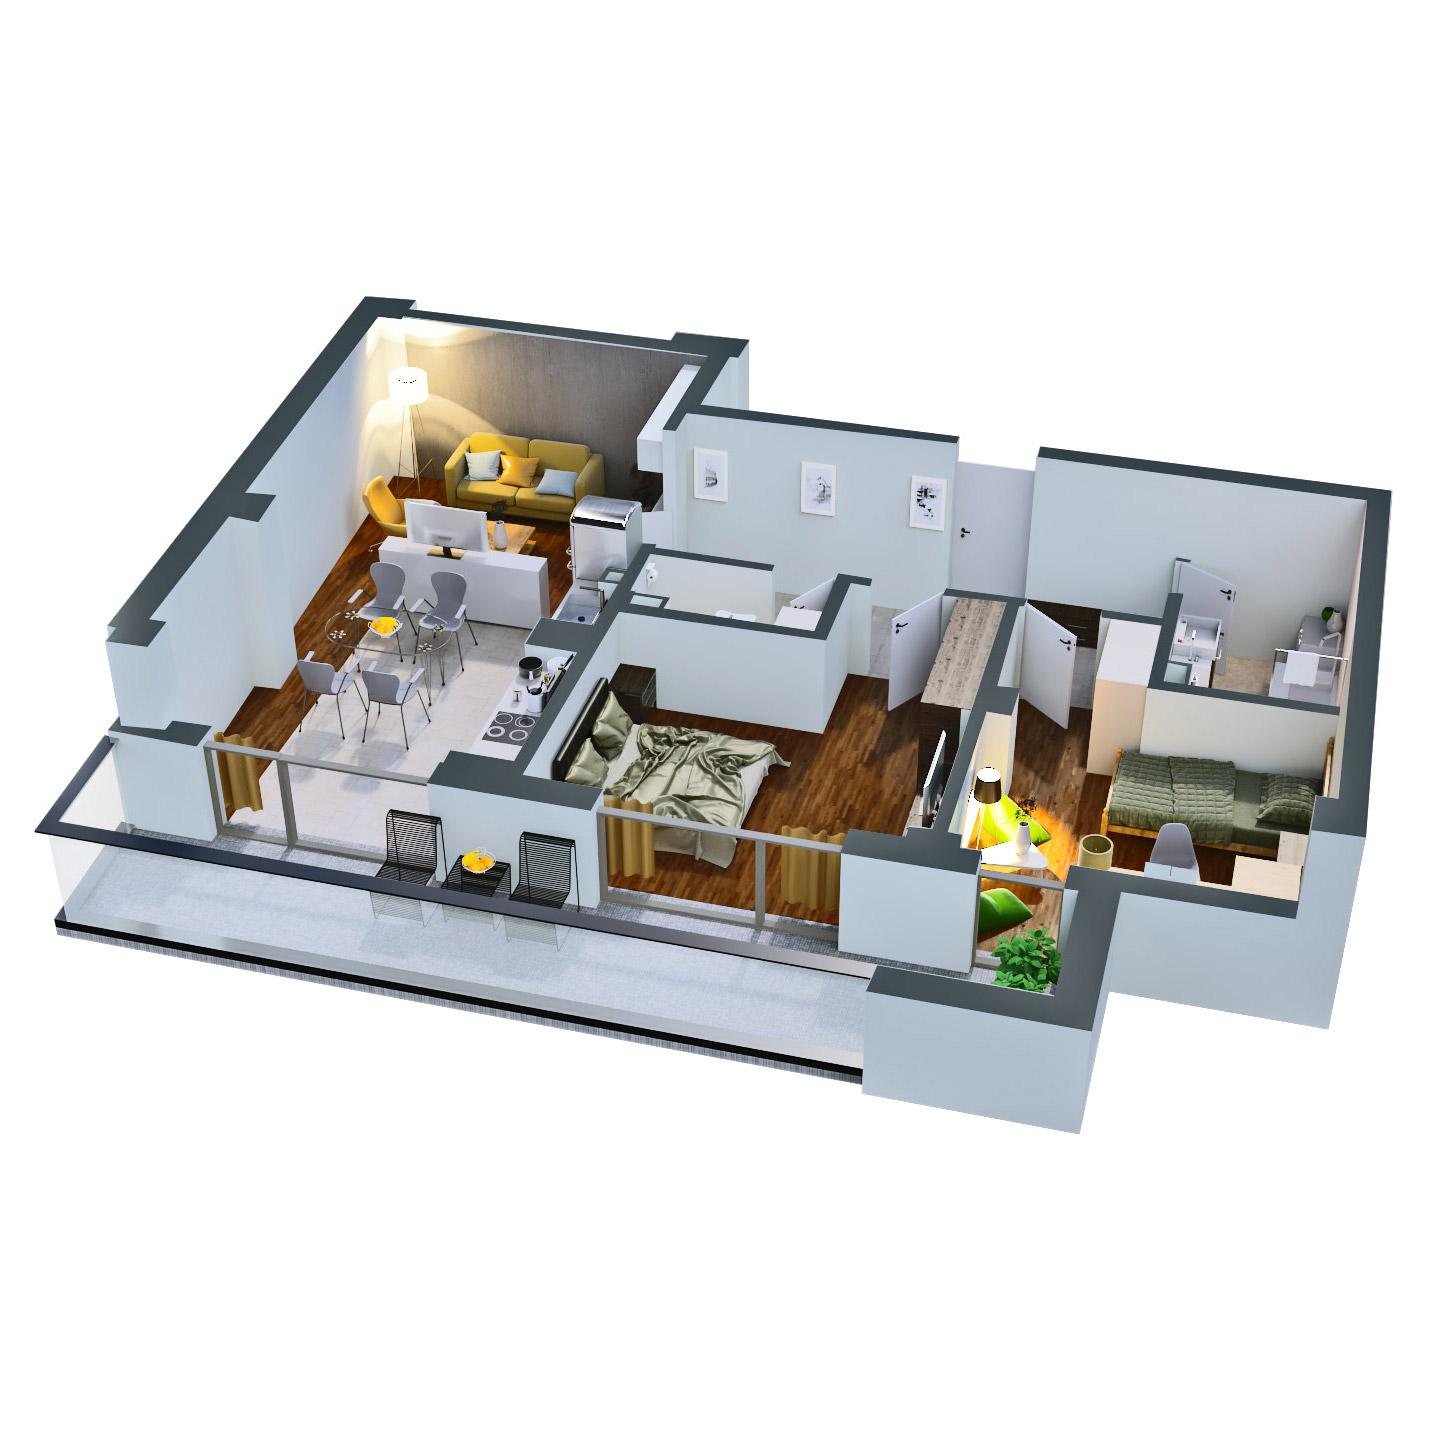 Apartament 3 camere de vanzare Bucuresti - Catedral Residence - Marriott, Piata Unirii, 13 Septembrie, Izvor - Tip 4 - T2A - D